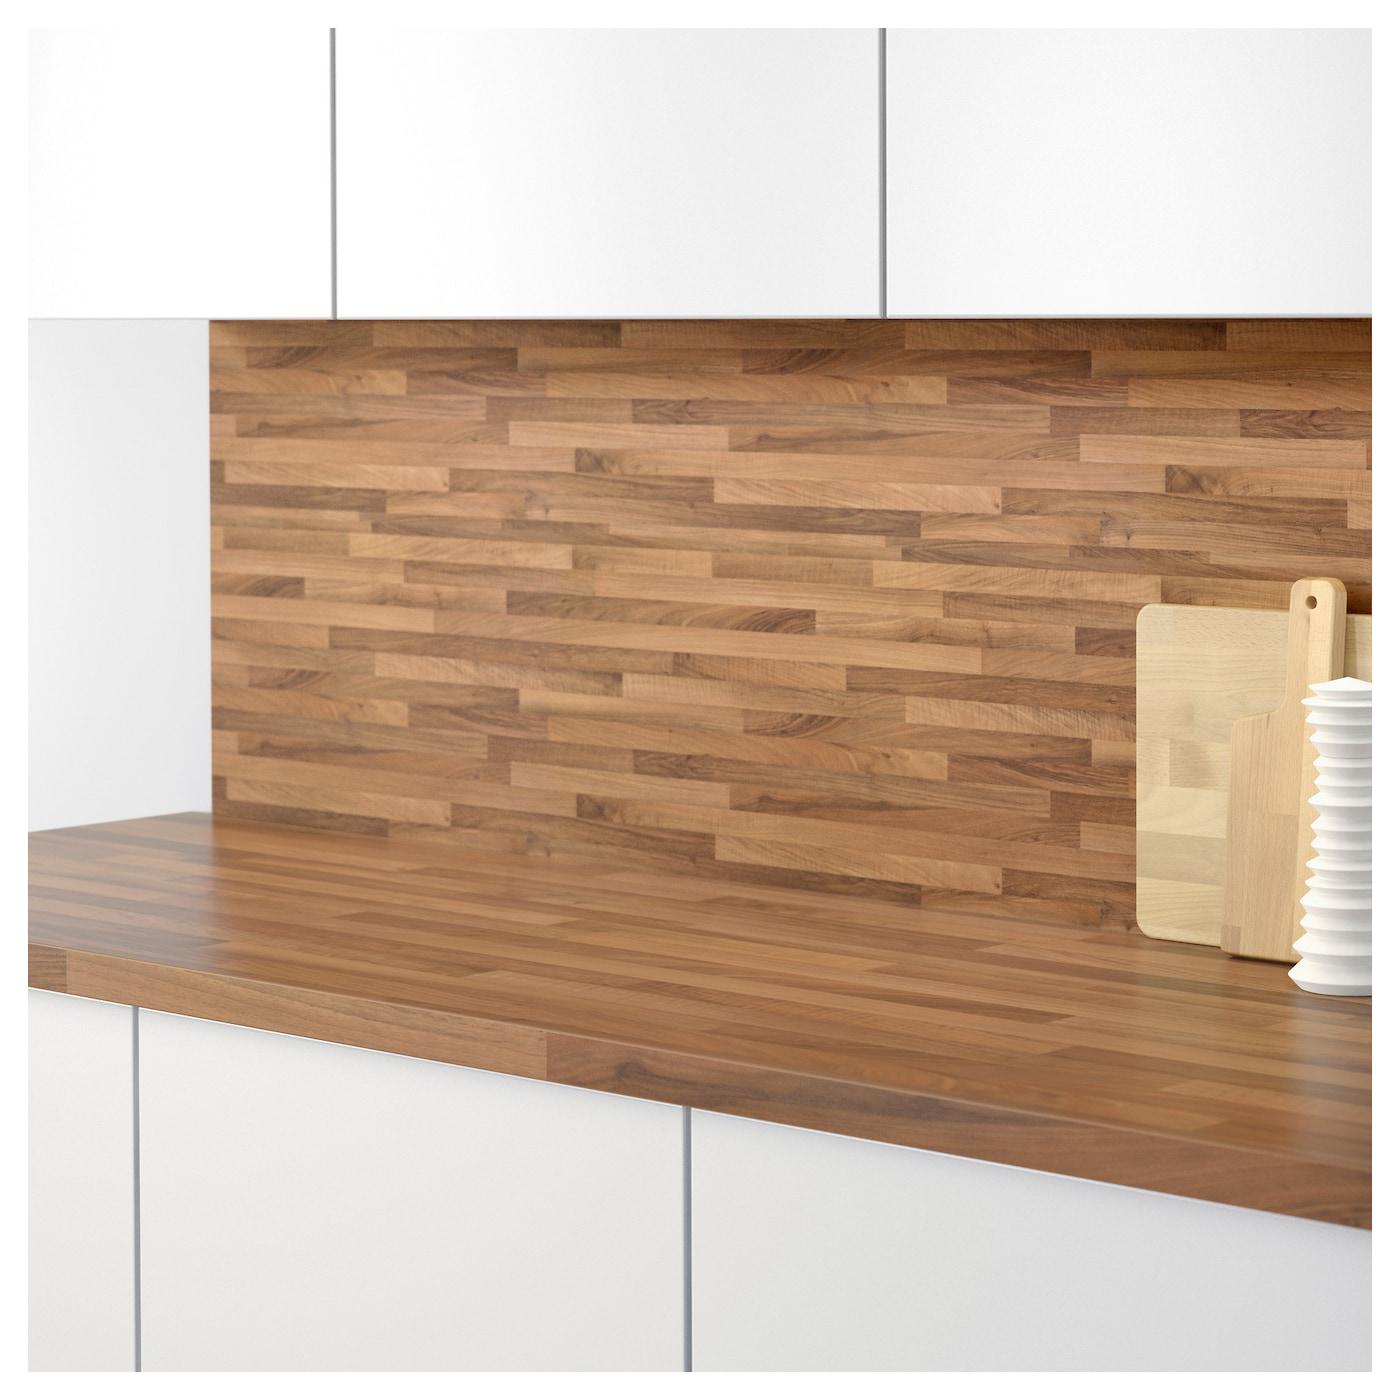 sibbarp rev tement mural sur mesure motif noyer clair stratifi 1 m ikea. Black Bedroom Furniture Sets. Home Design Ideas